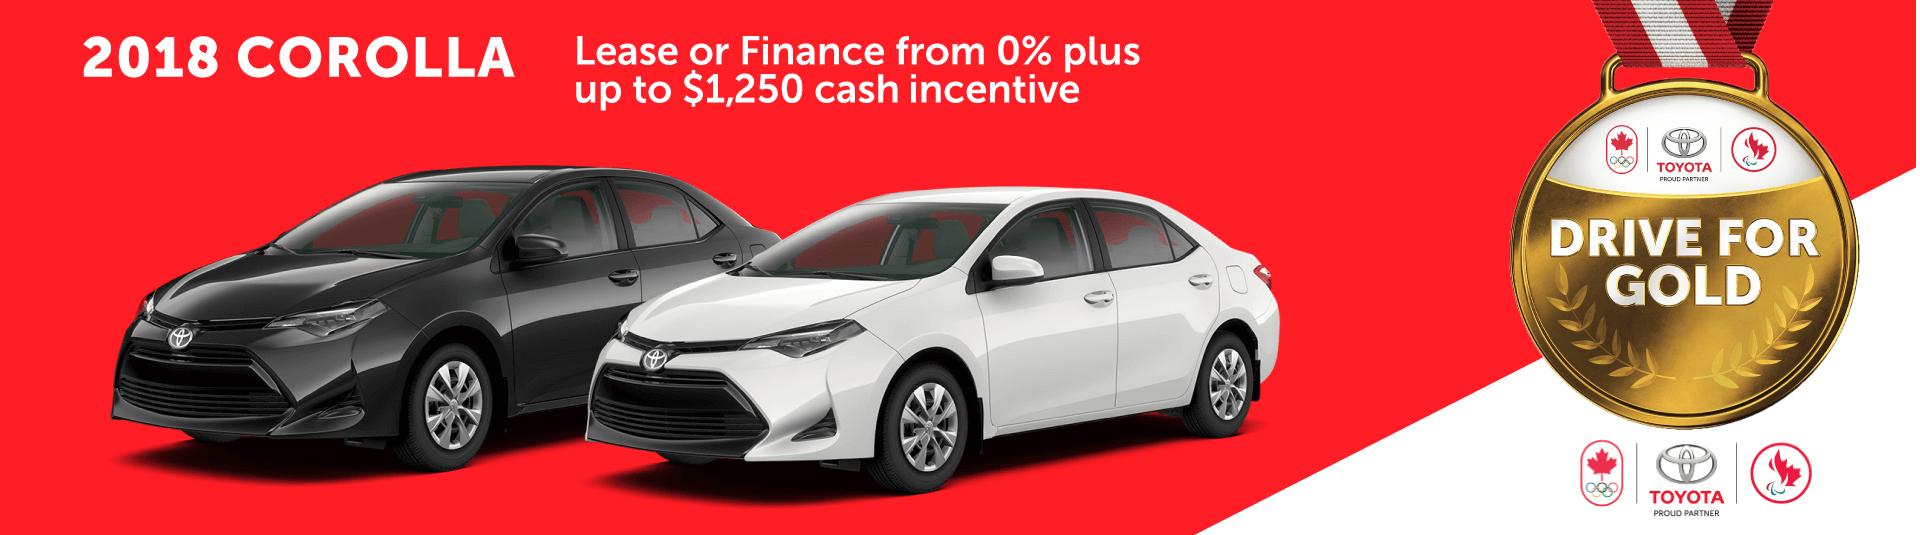 2018 Toyota Corolla Sales